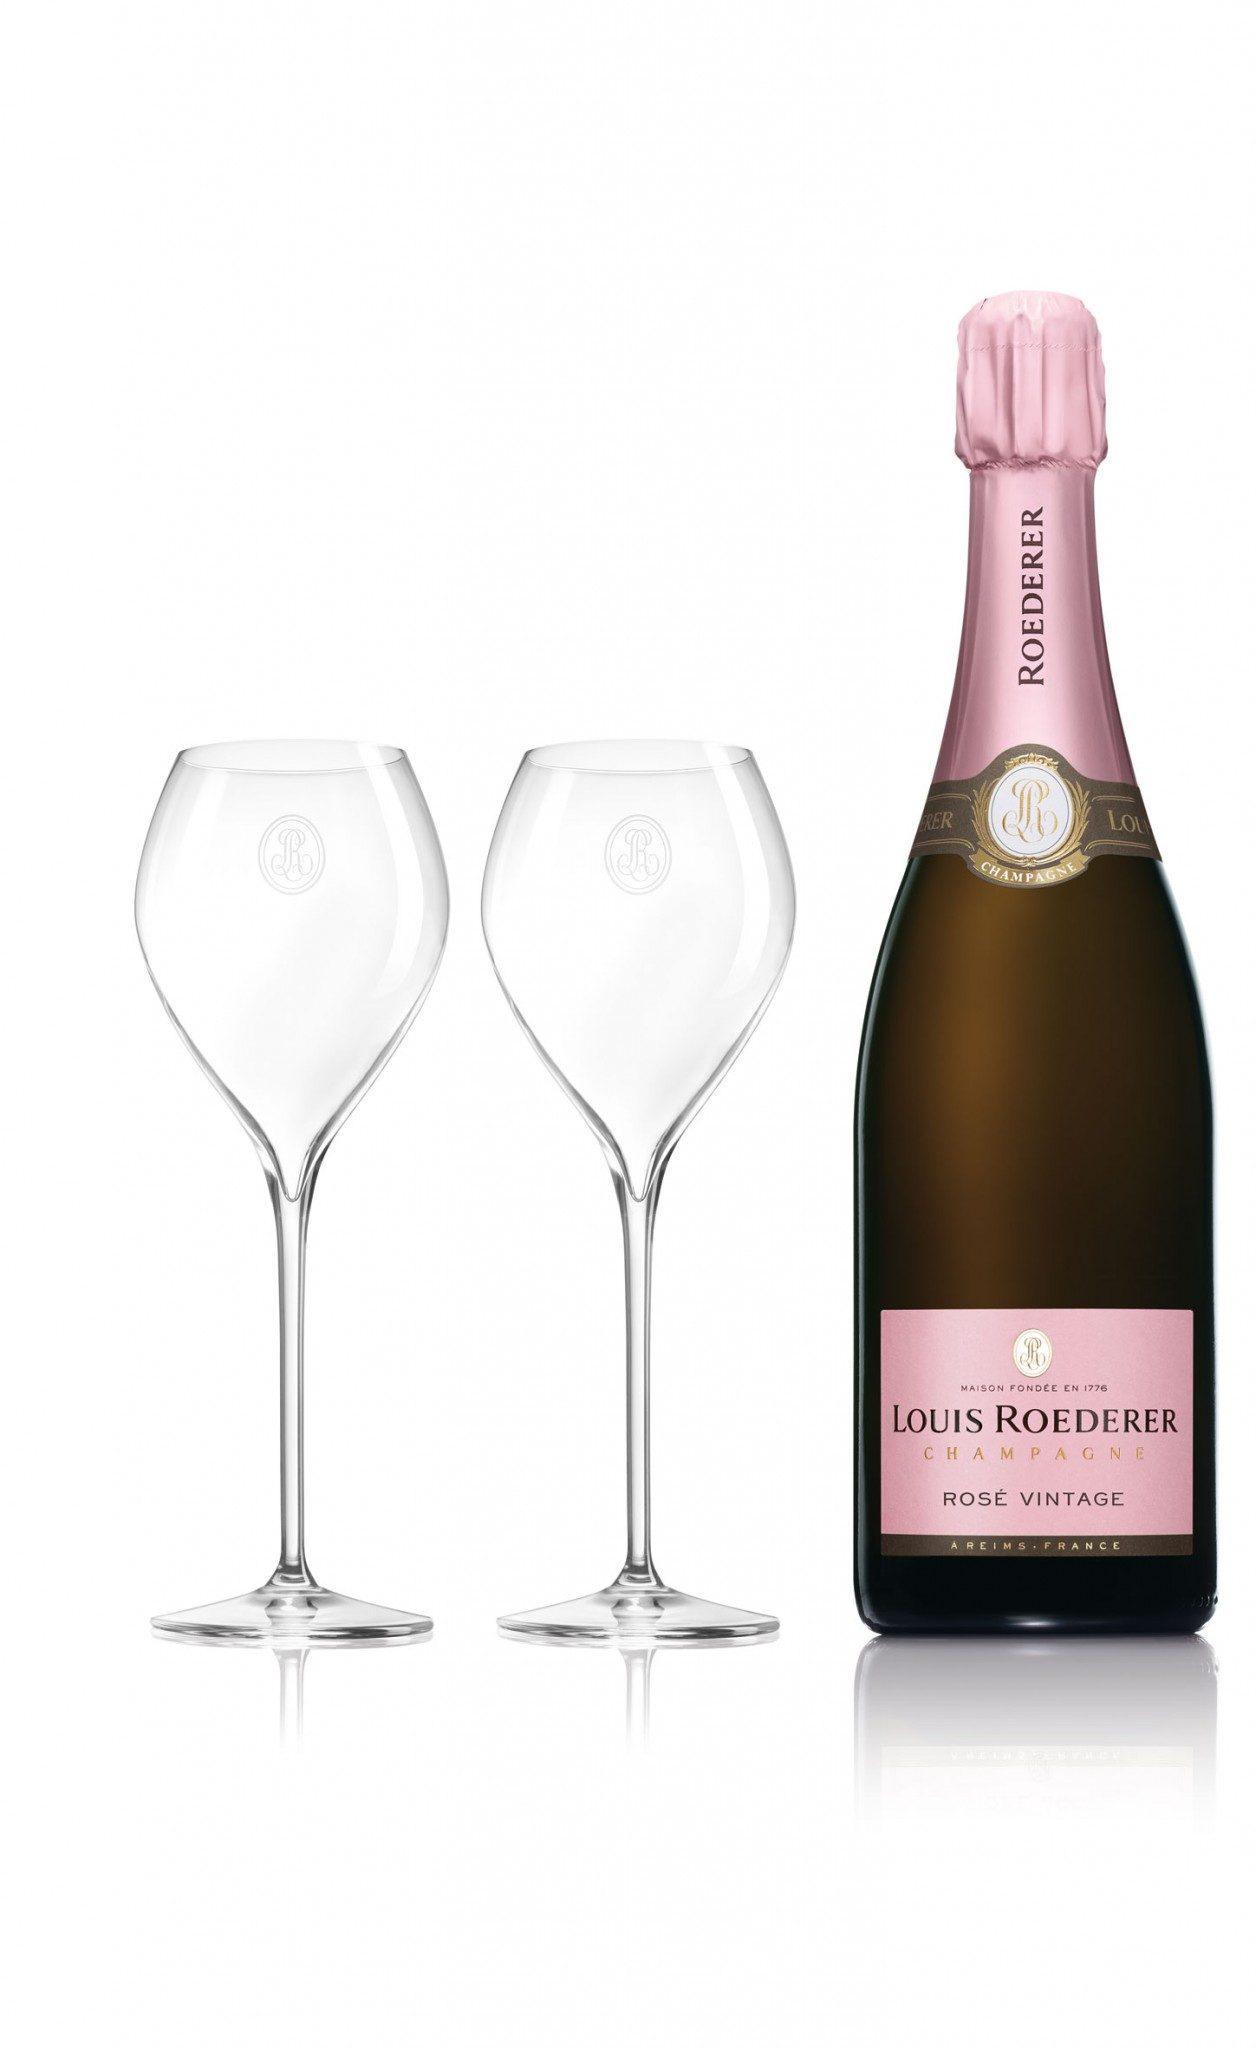 idee-champagne-cadeau-saint-valentin-2017-louis-roederer-rose